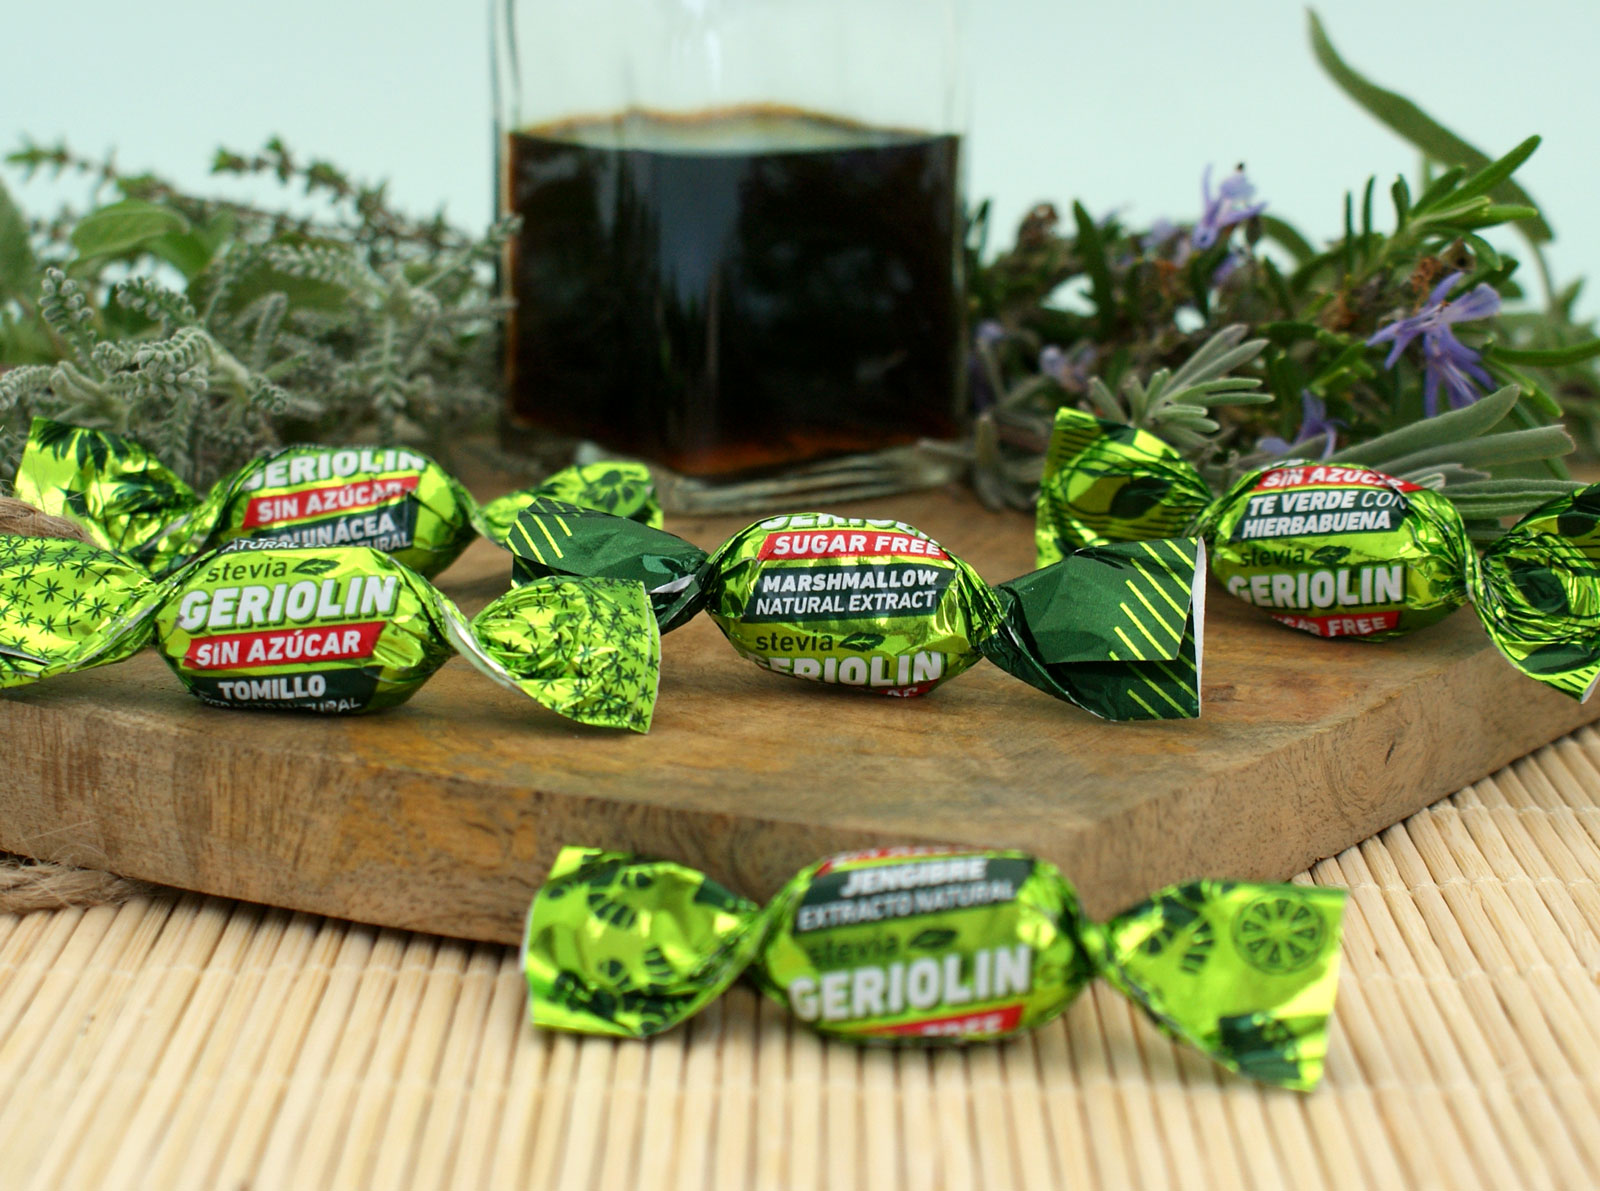 caramelos hierbas sin azucar estevia